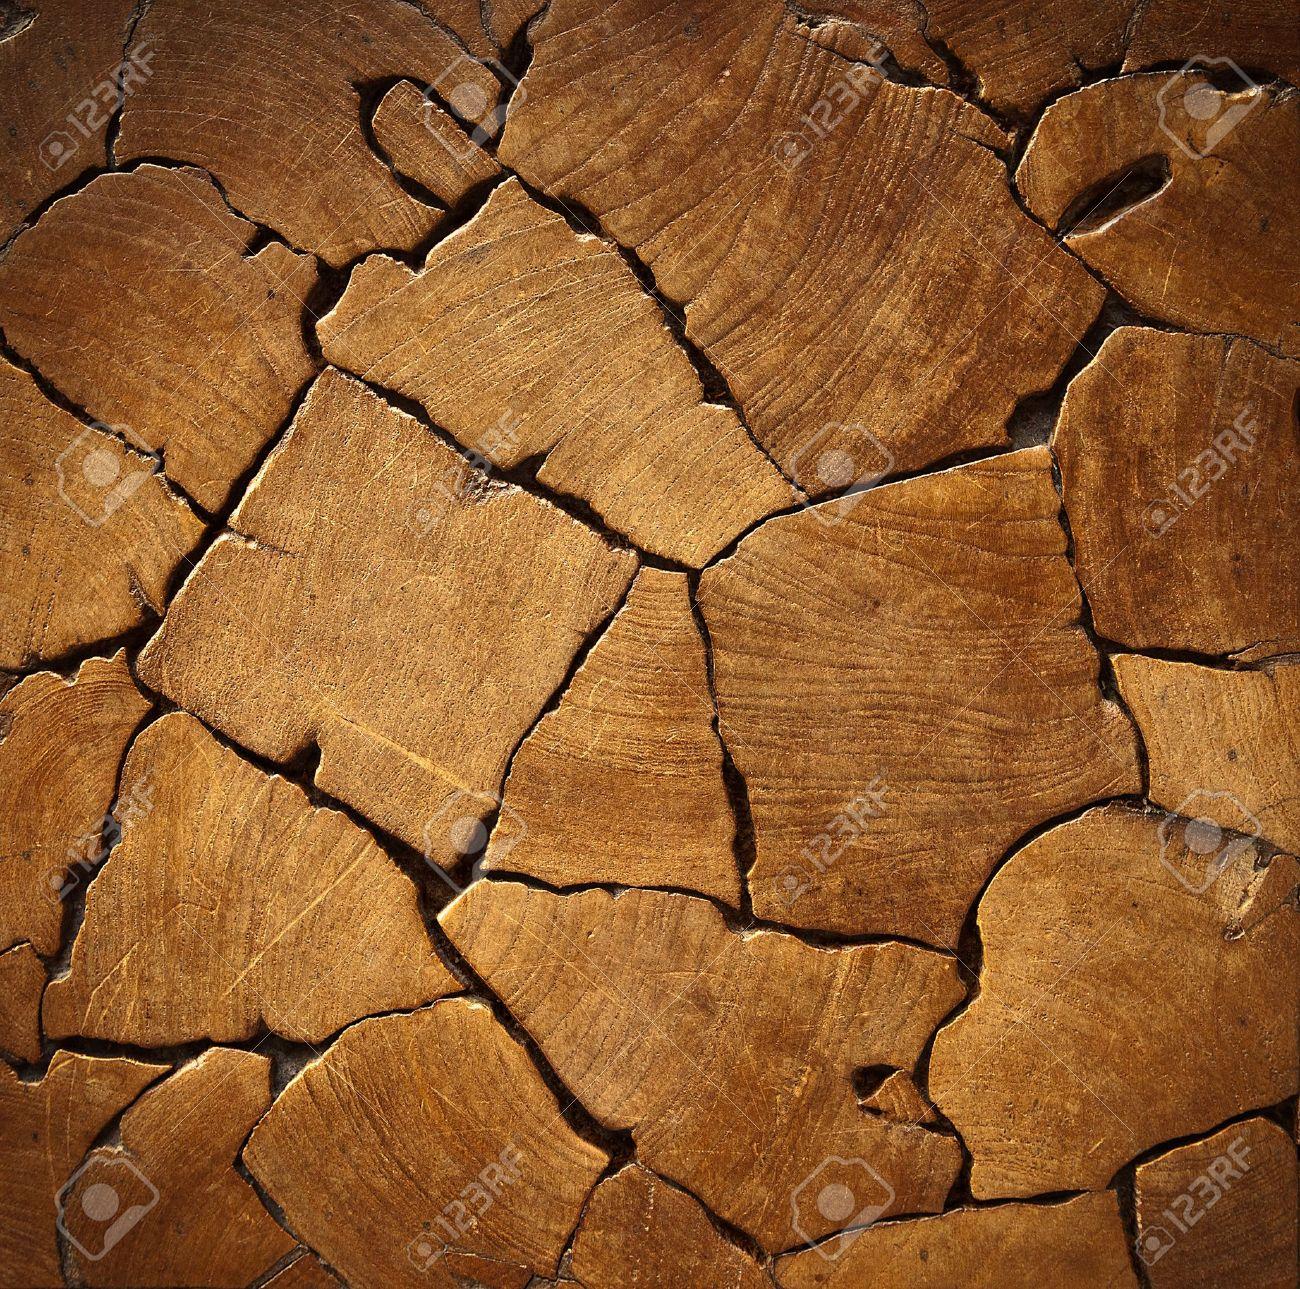 Pics photos wood texture background - Decorate Wood Texture Background Stock Photo 13812184